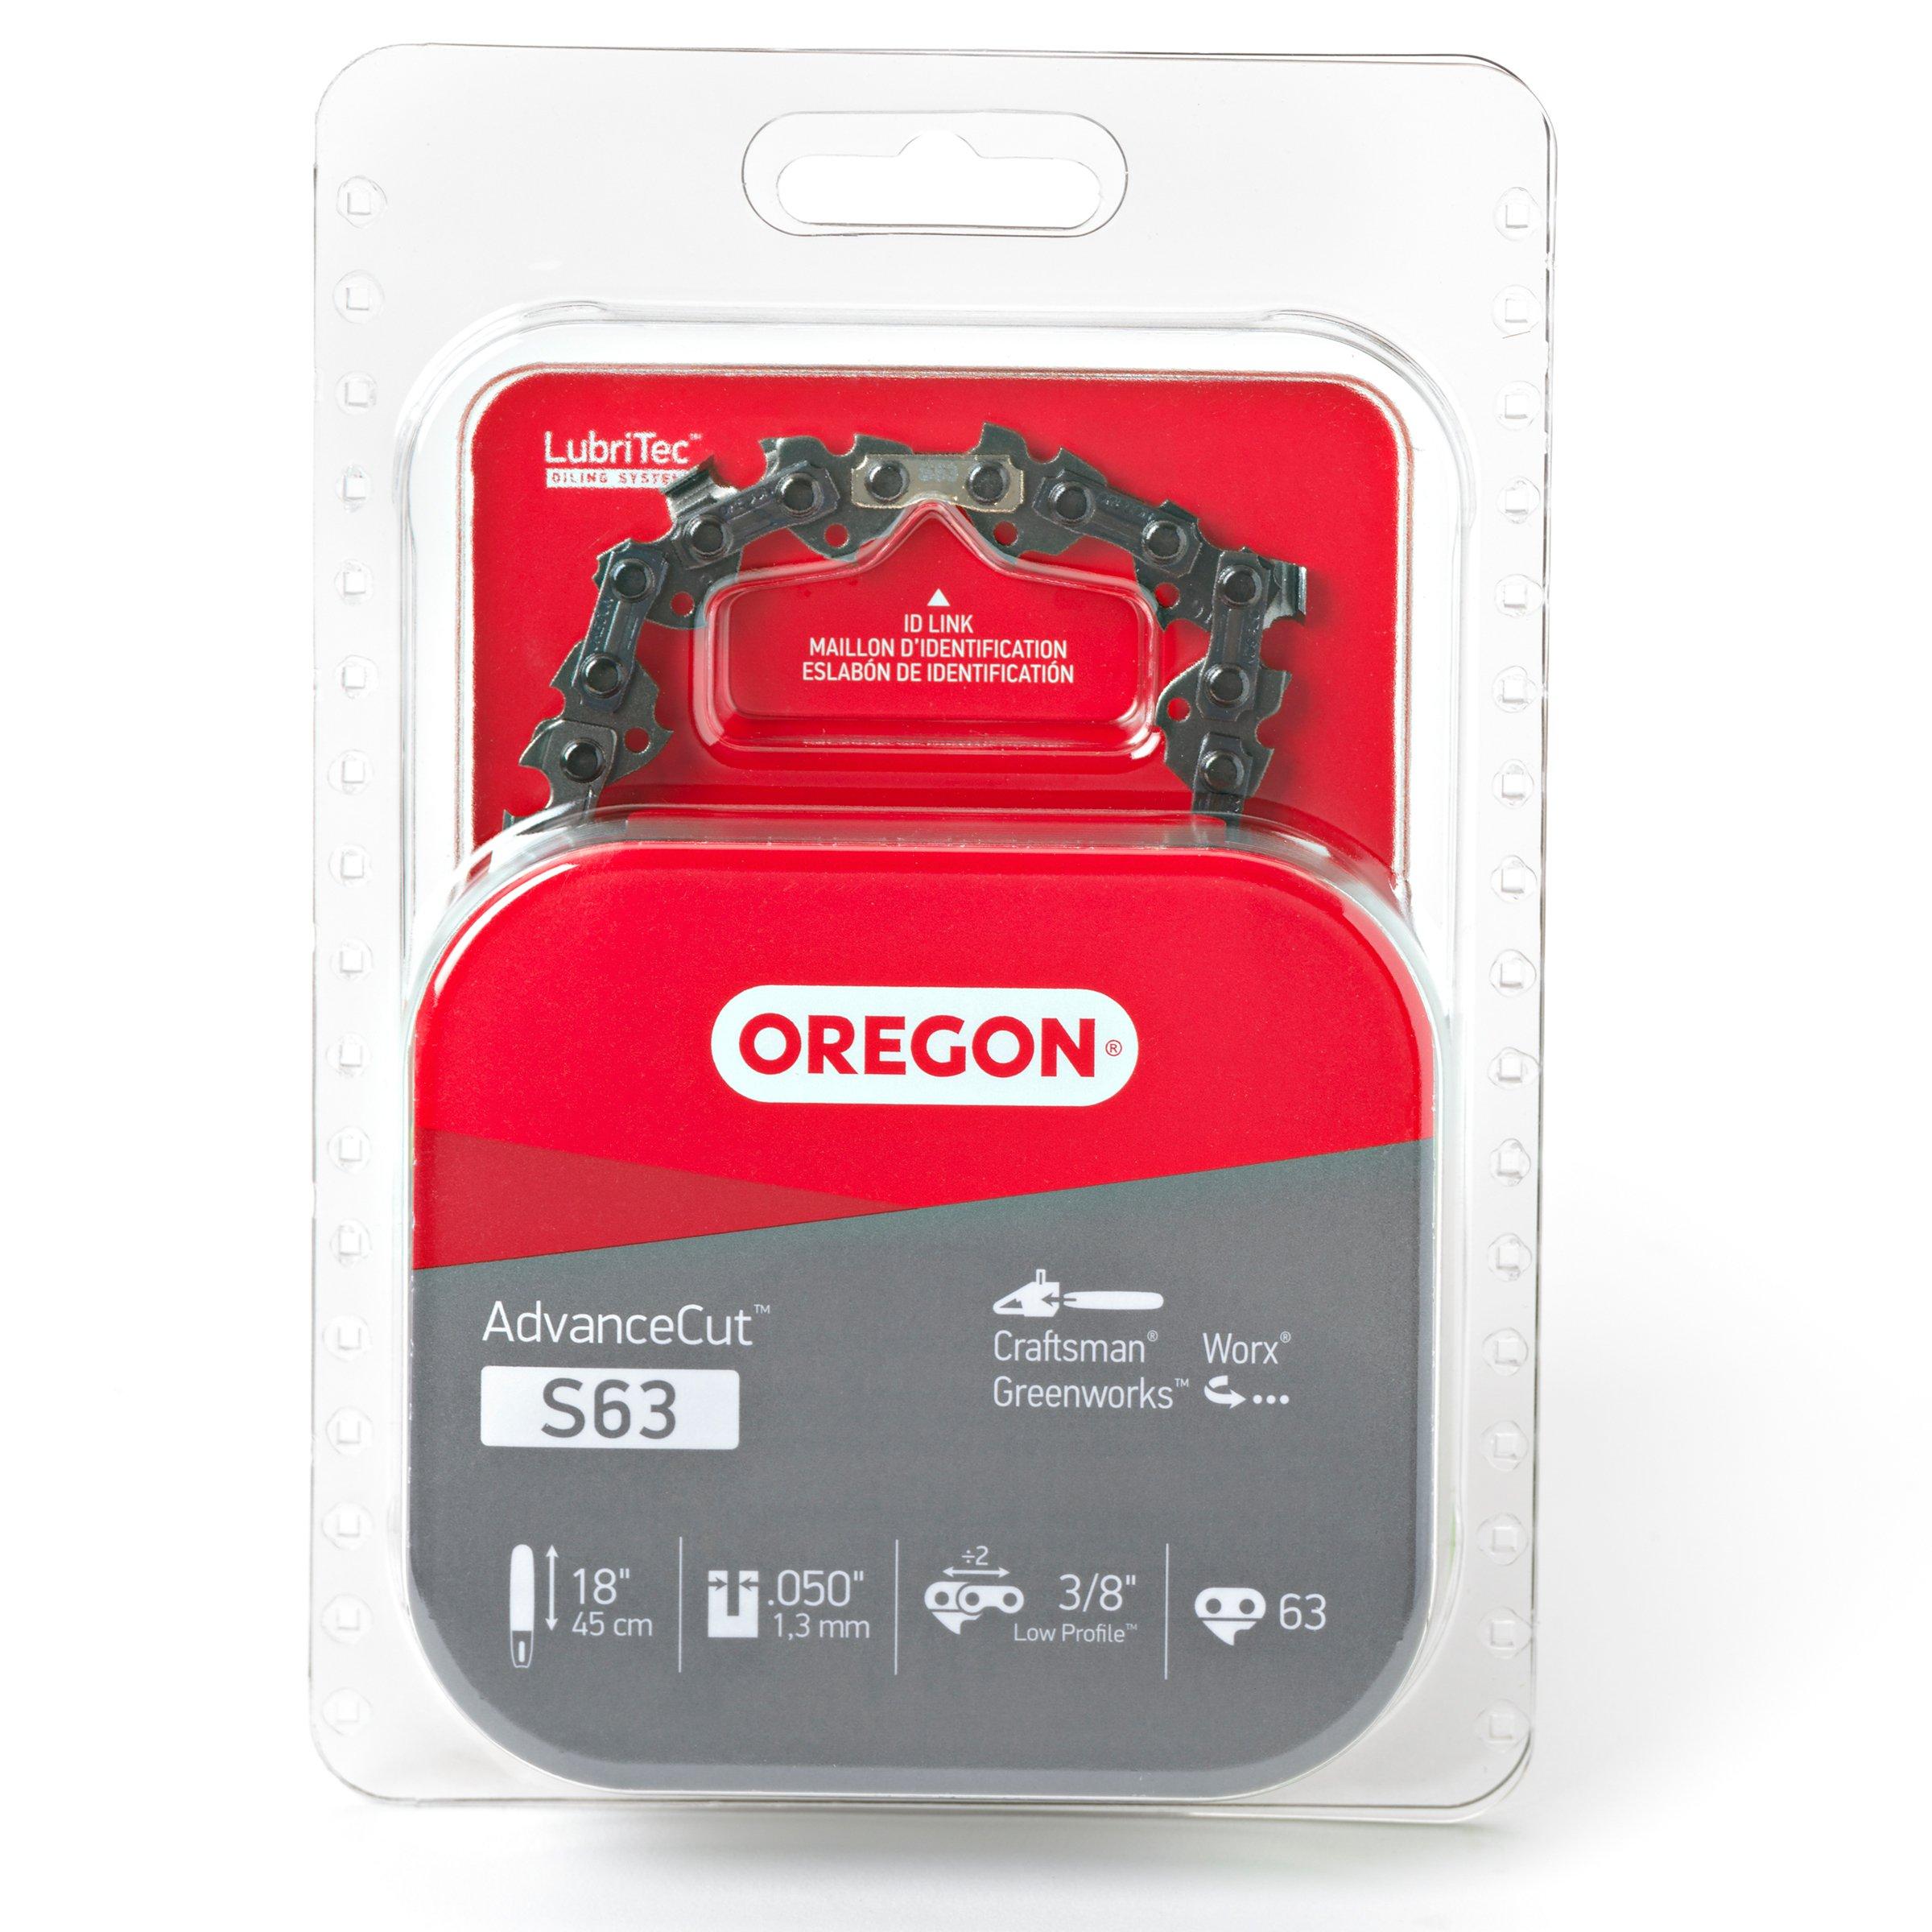 Oregon S63 AdvanceCut 18-Inch Chainsaw Chain, Fits Craftsman, Worx, Greenworks, Grey